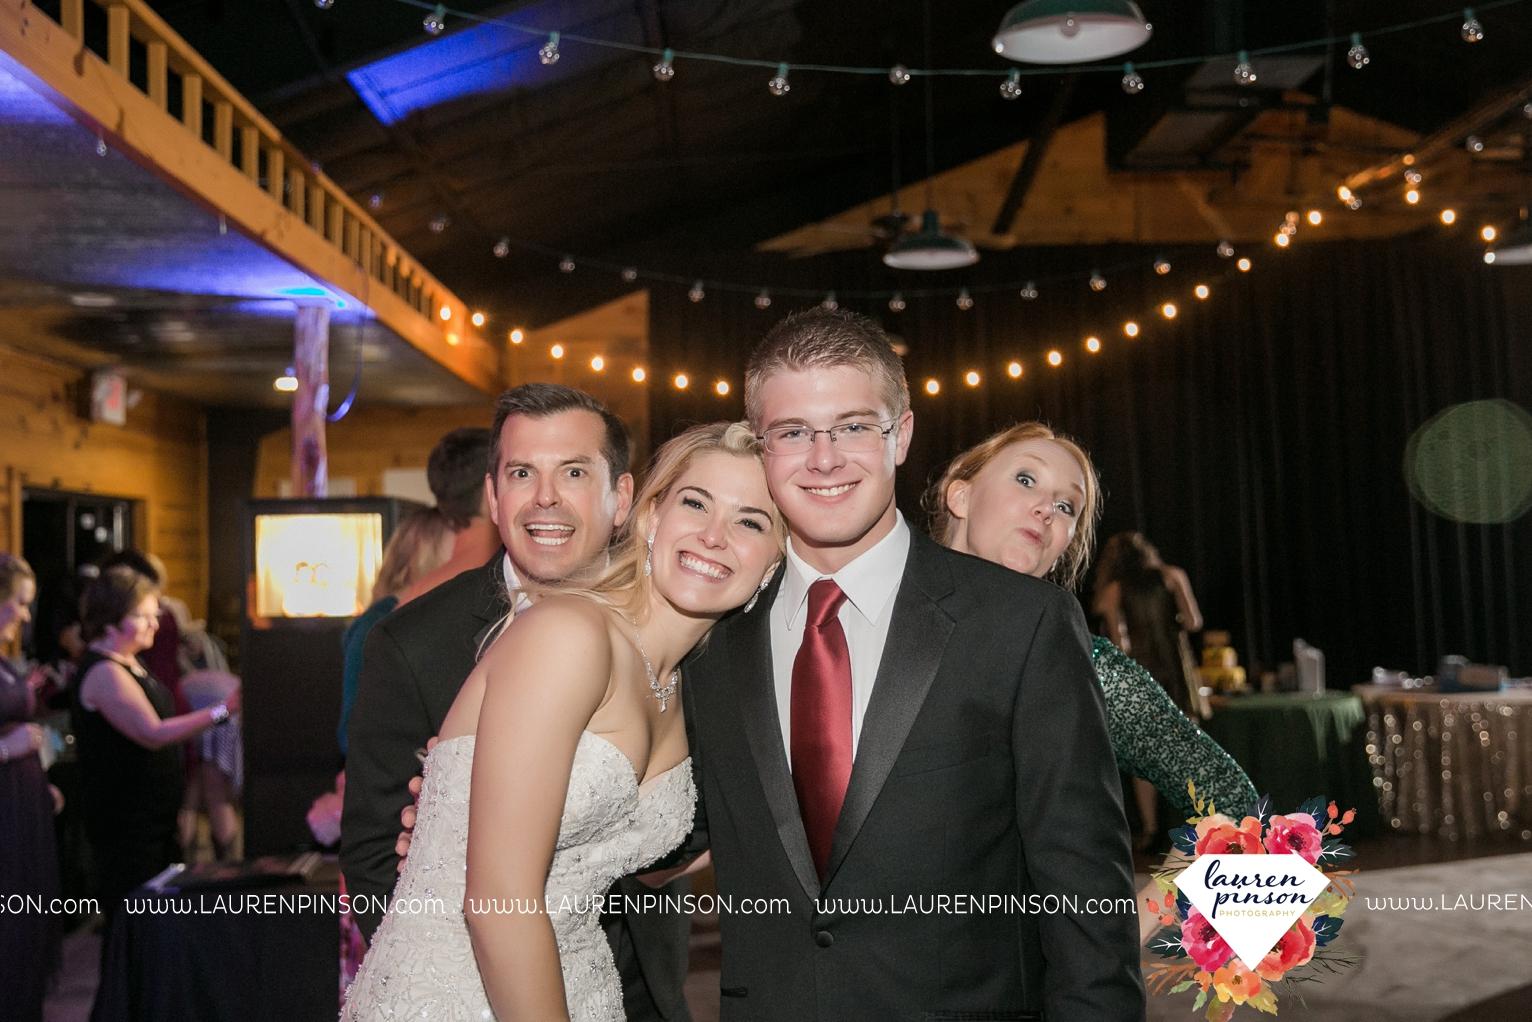 rustic-wichita-falls-texas-wedding-photographer-gold-glam-mayfield-events-market-street-united-allue-bridals-fall_1789.jpg